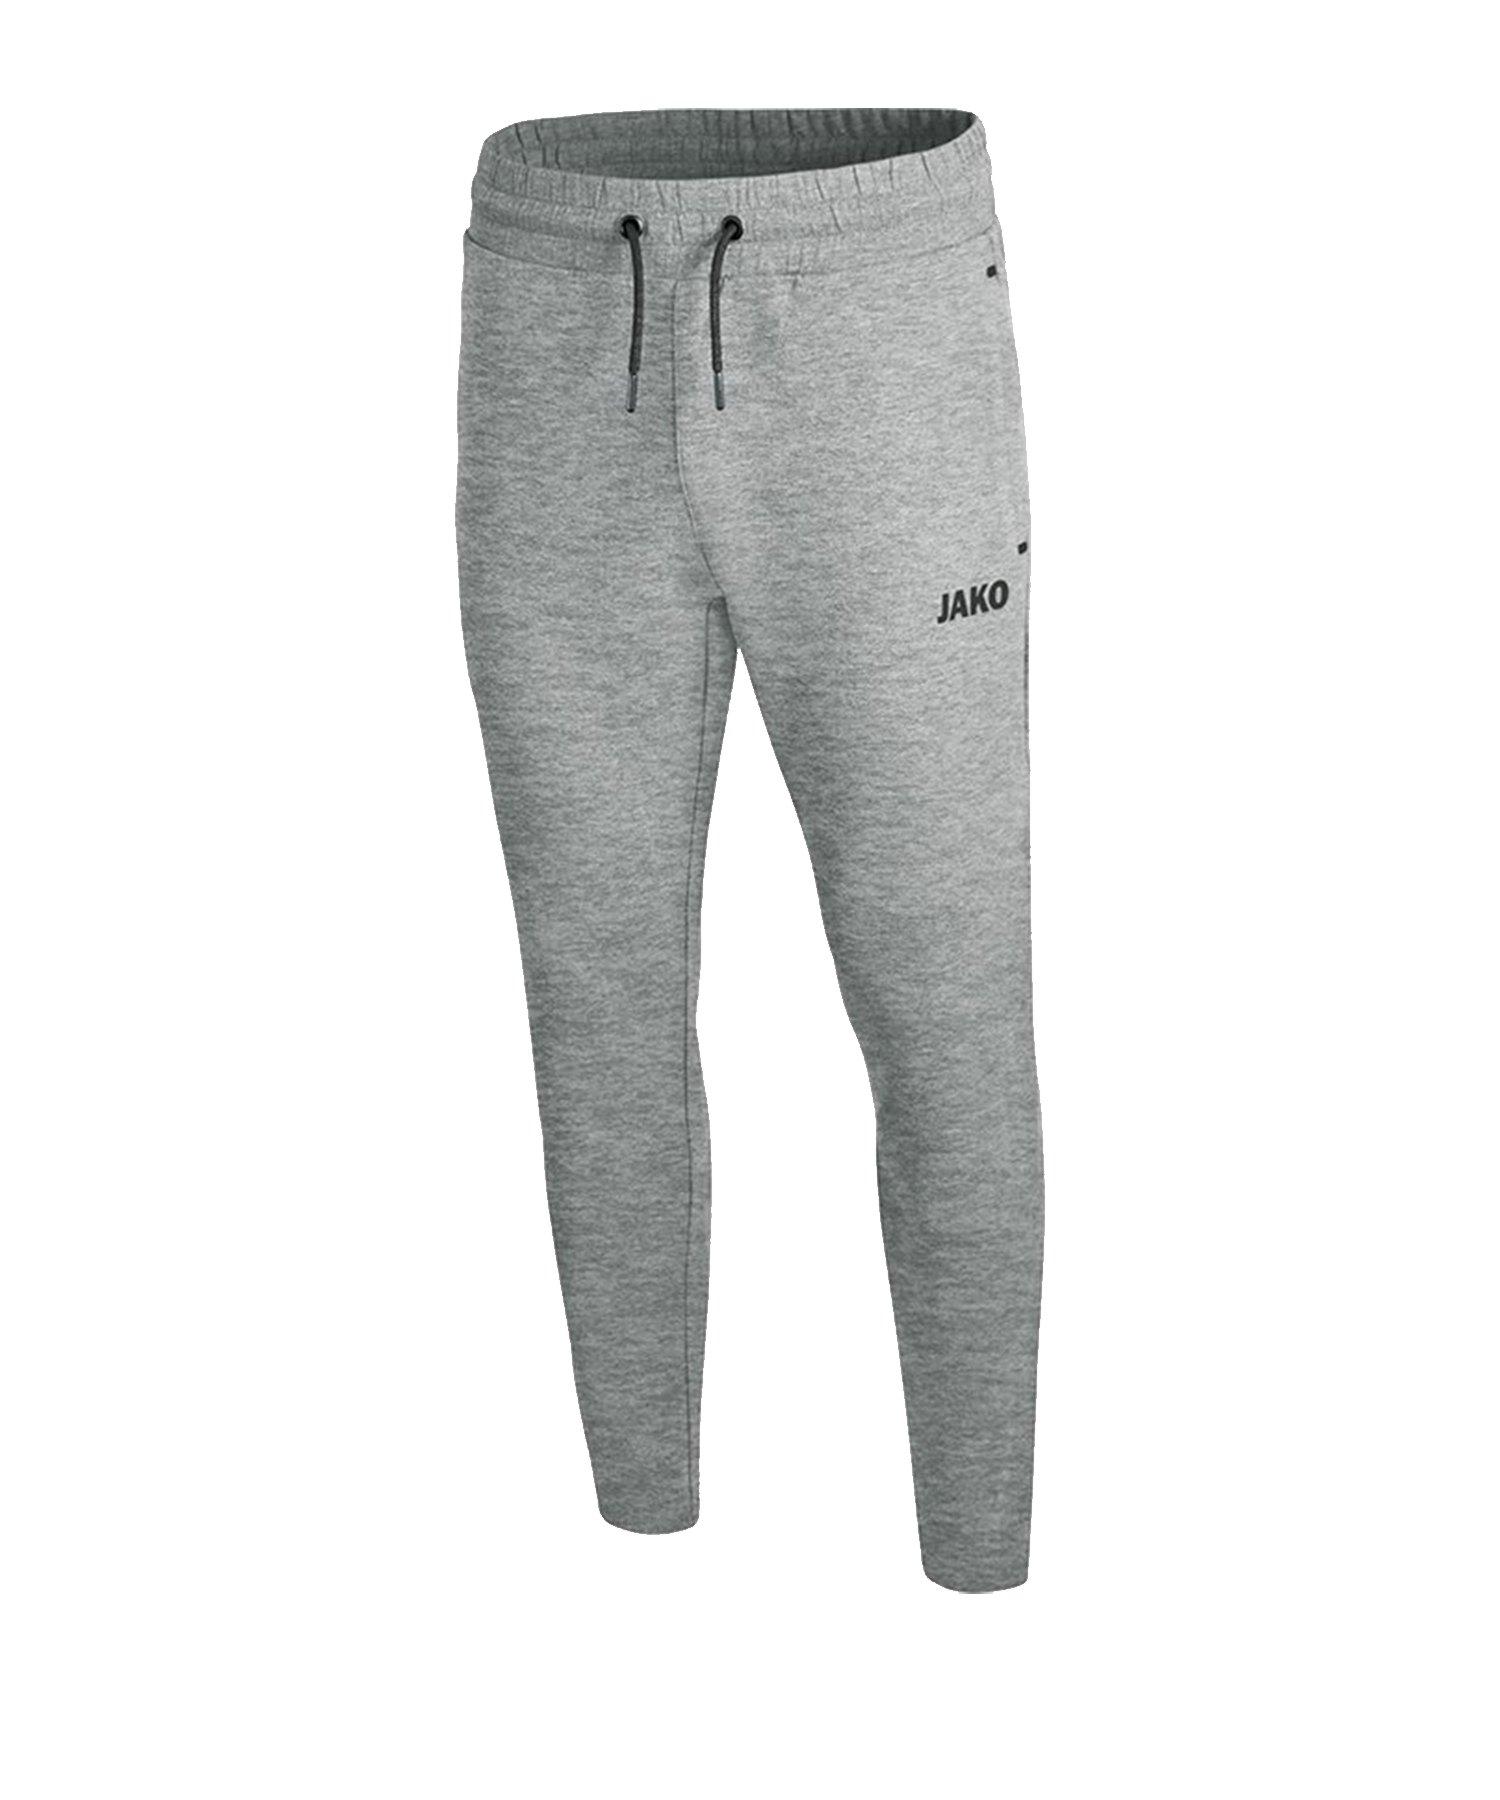 Jako Premium Basic Jogginghose Grau F40 - grau